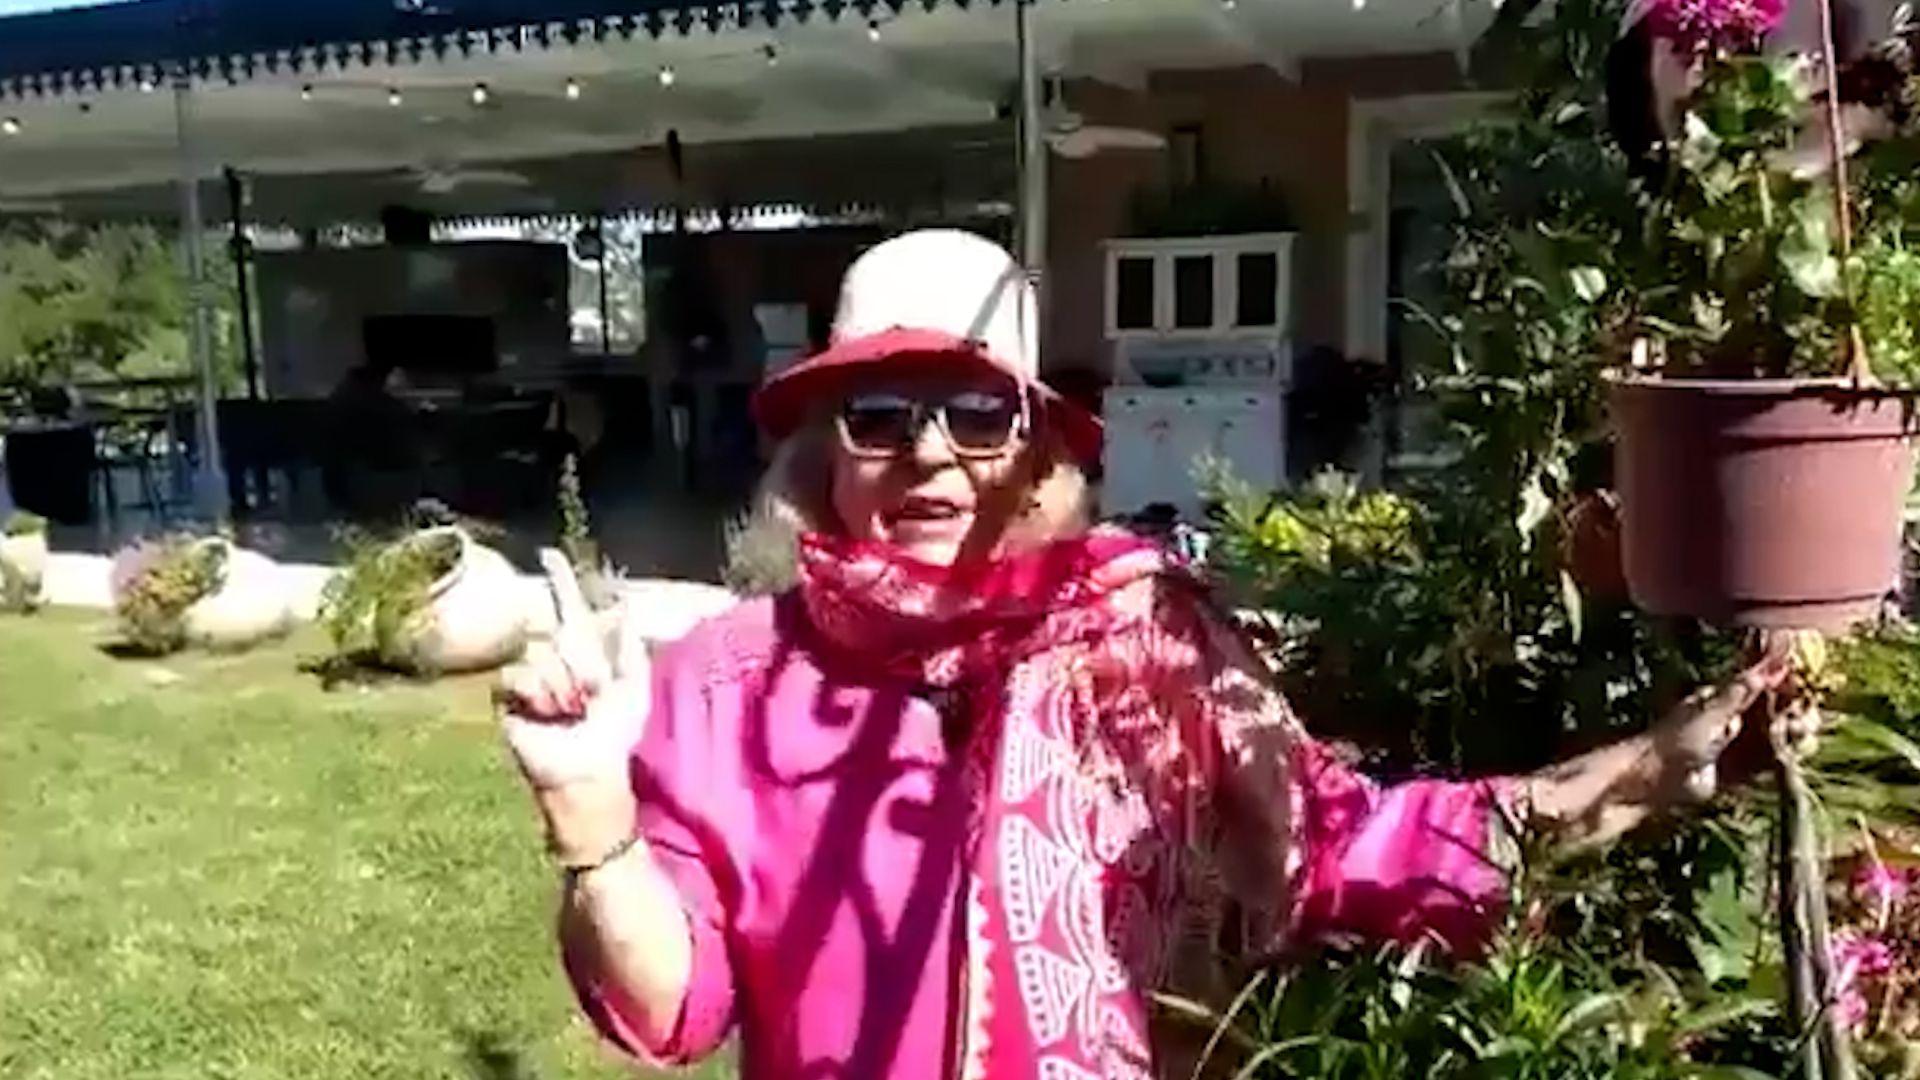 Elisa Carrió le respondió a los senadores que la trataron de gorda